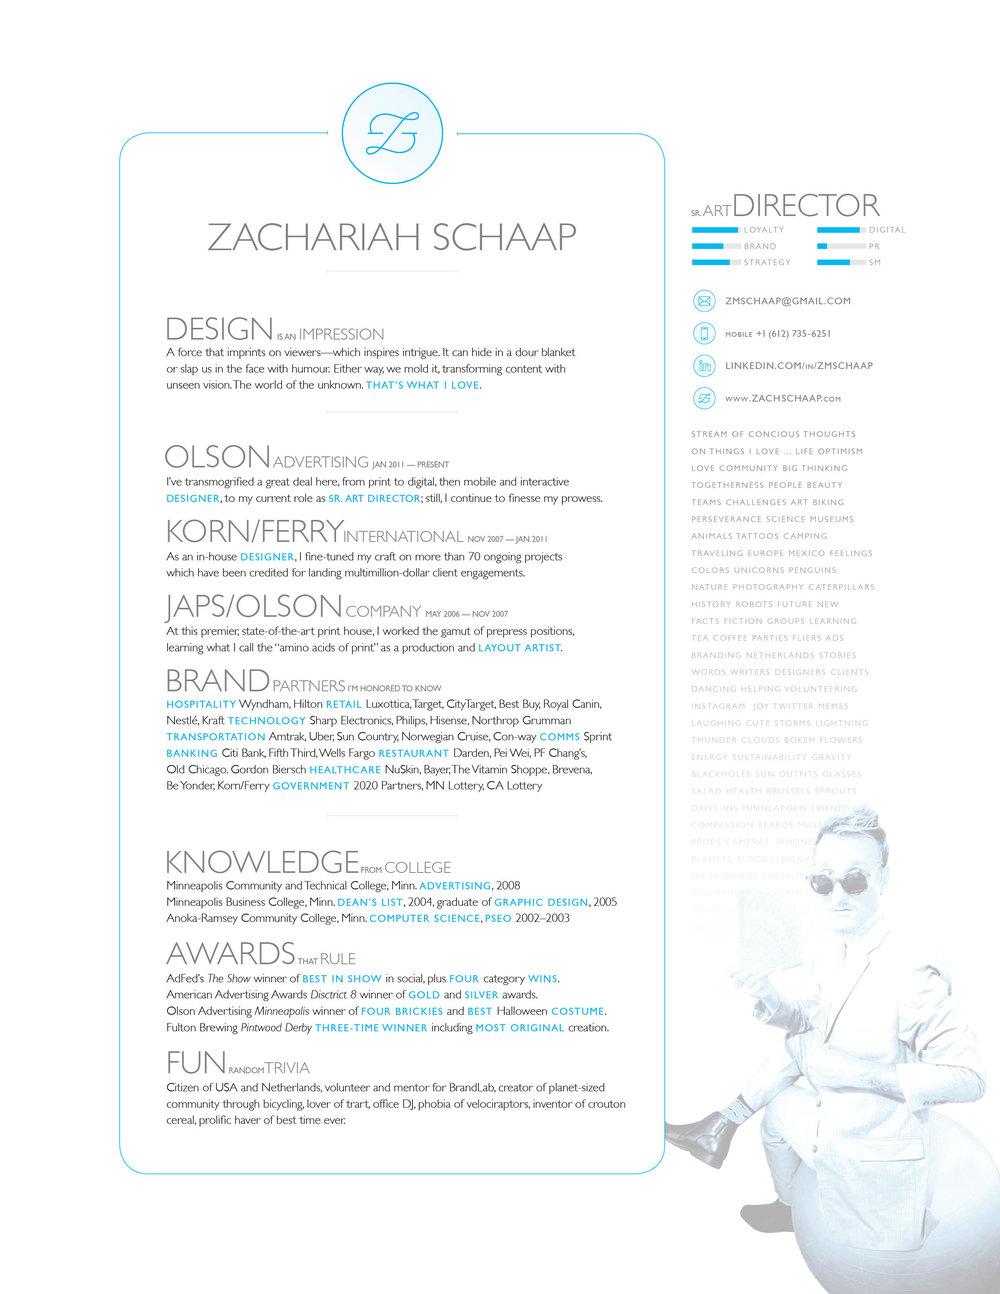 Zachariah_Schaap_Resume_2019.jpg